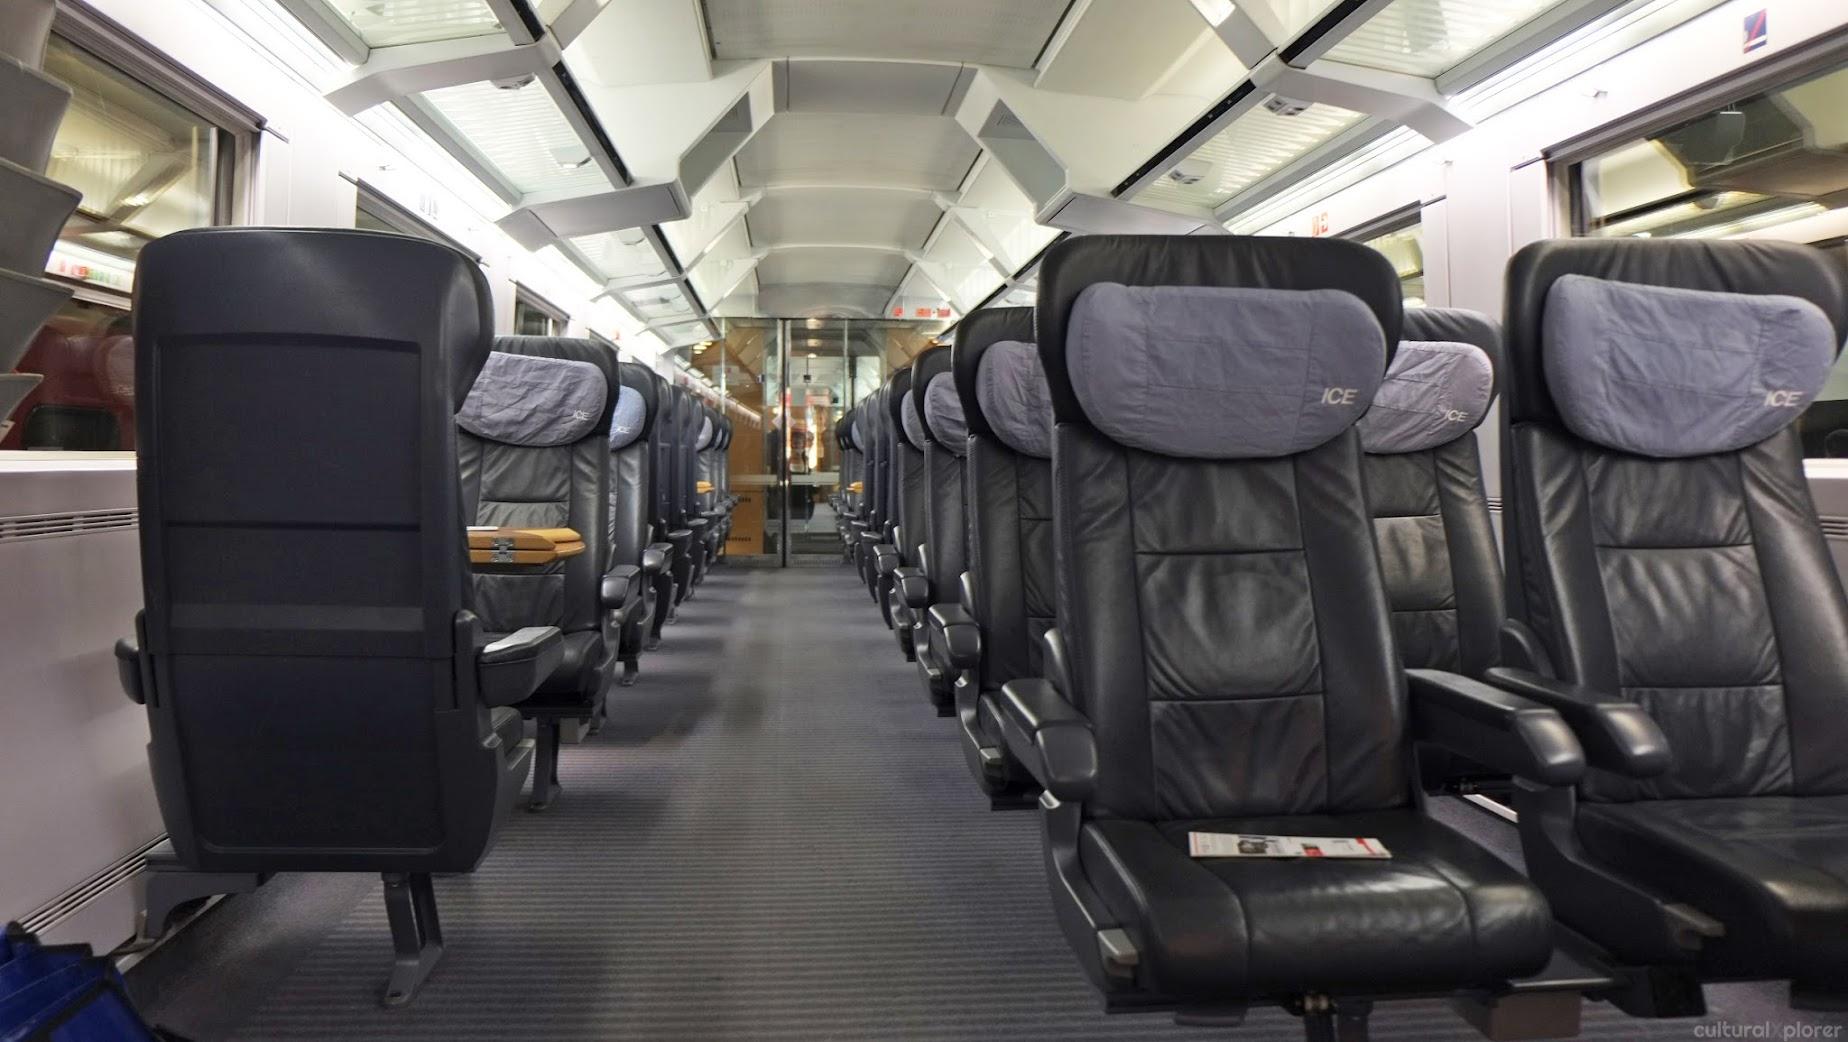 First class train through Switzerland into Germany